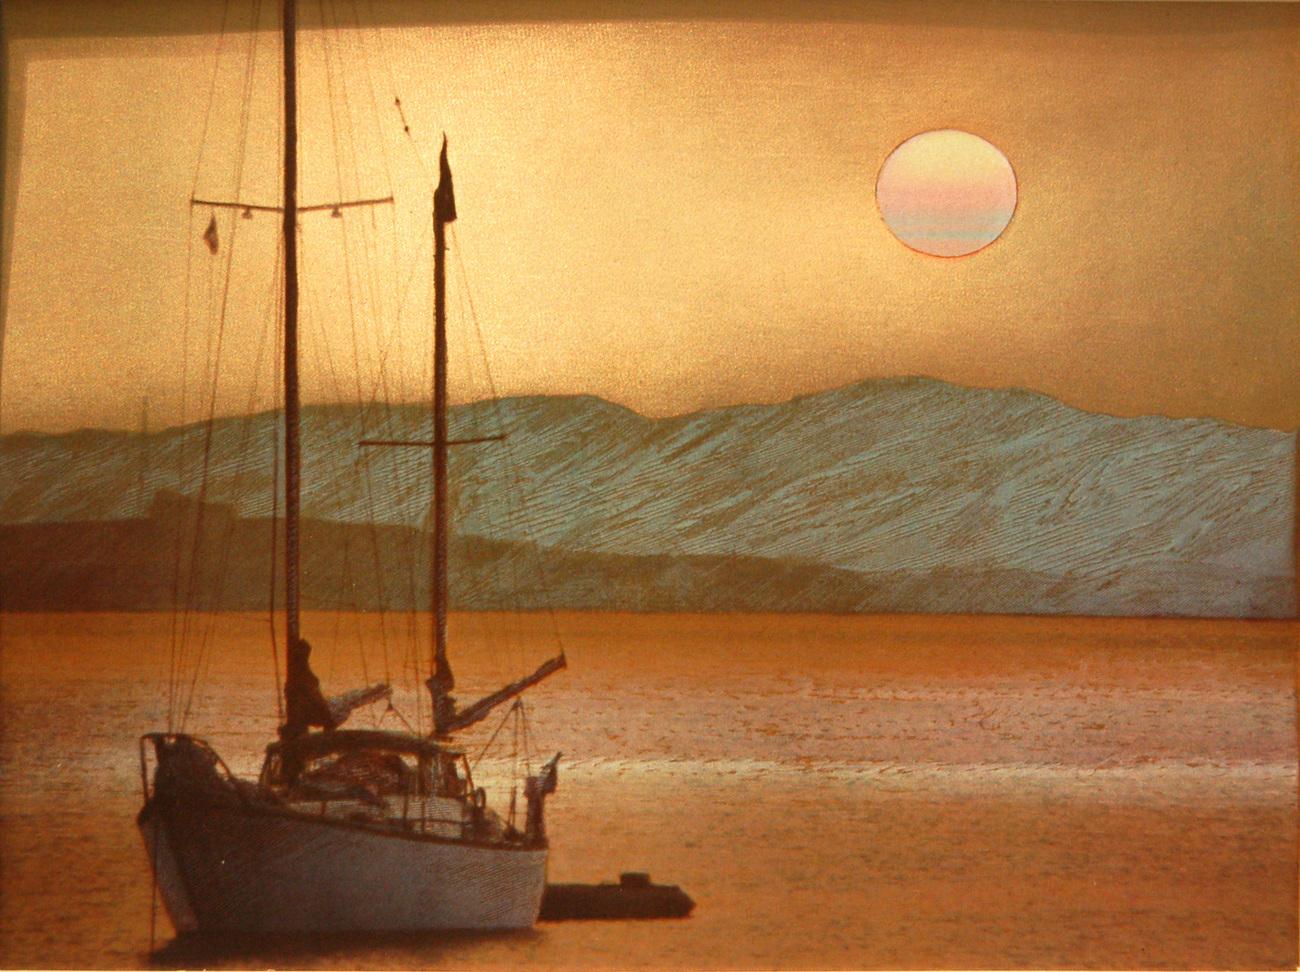 152639 single boat at dusk